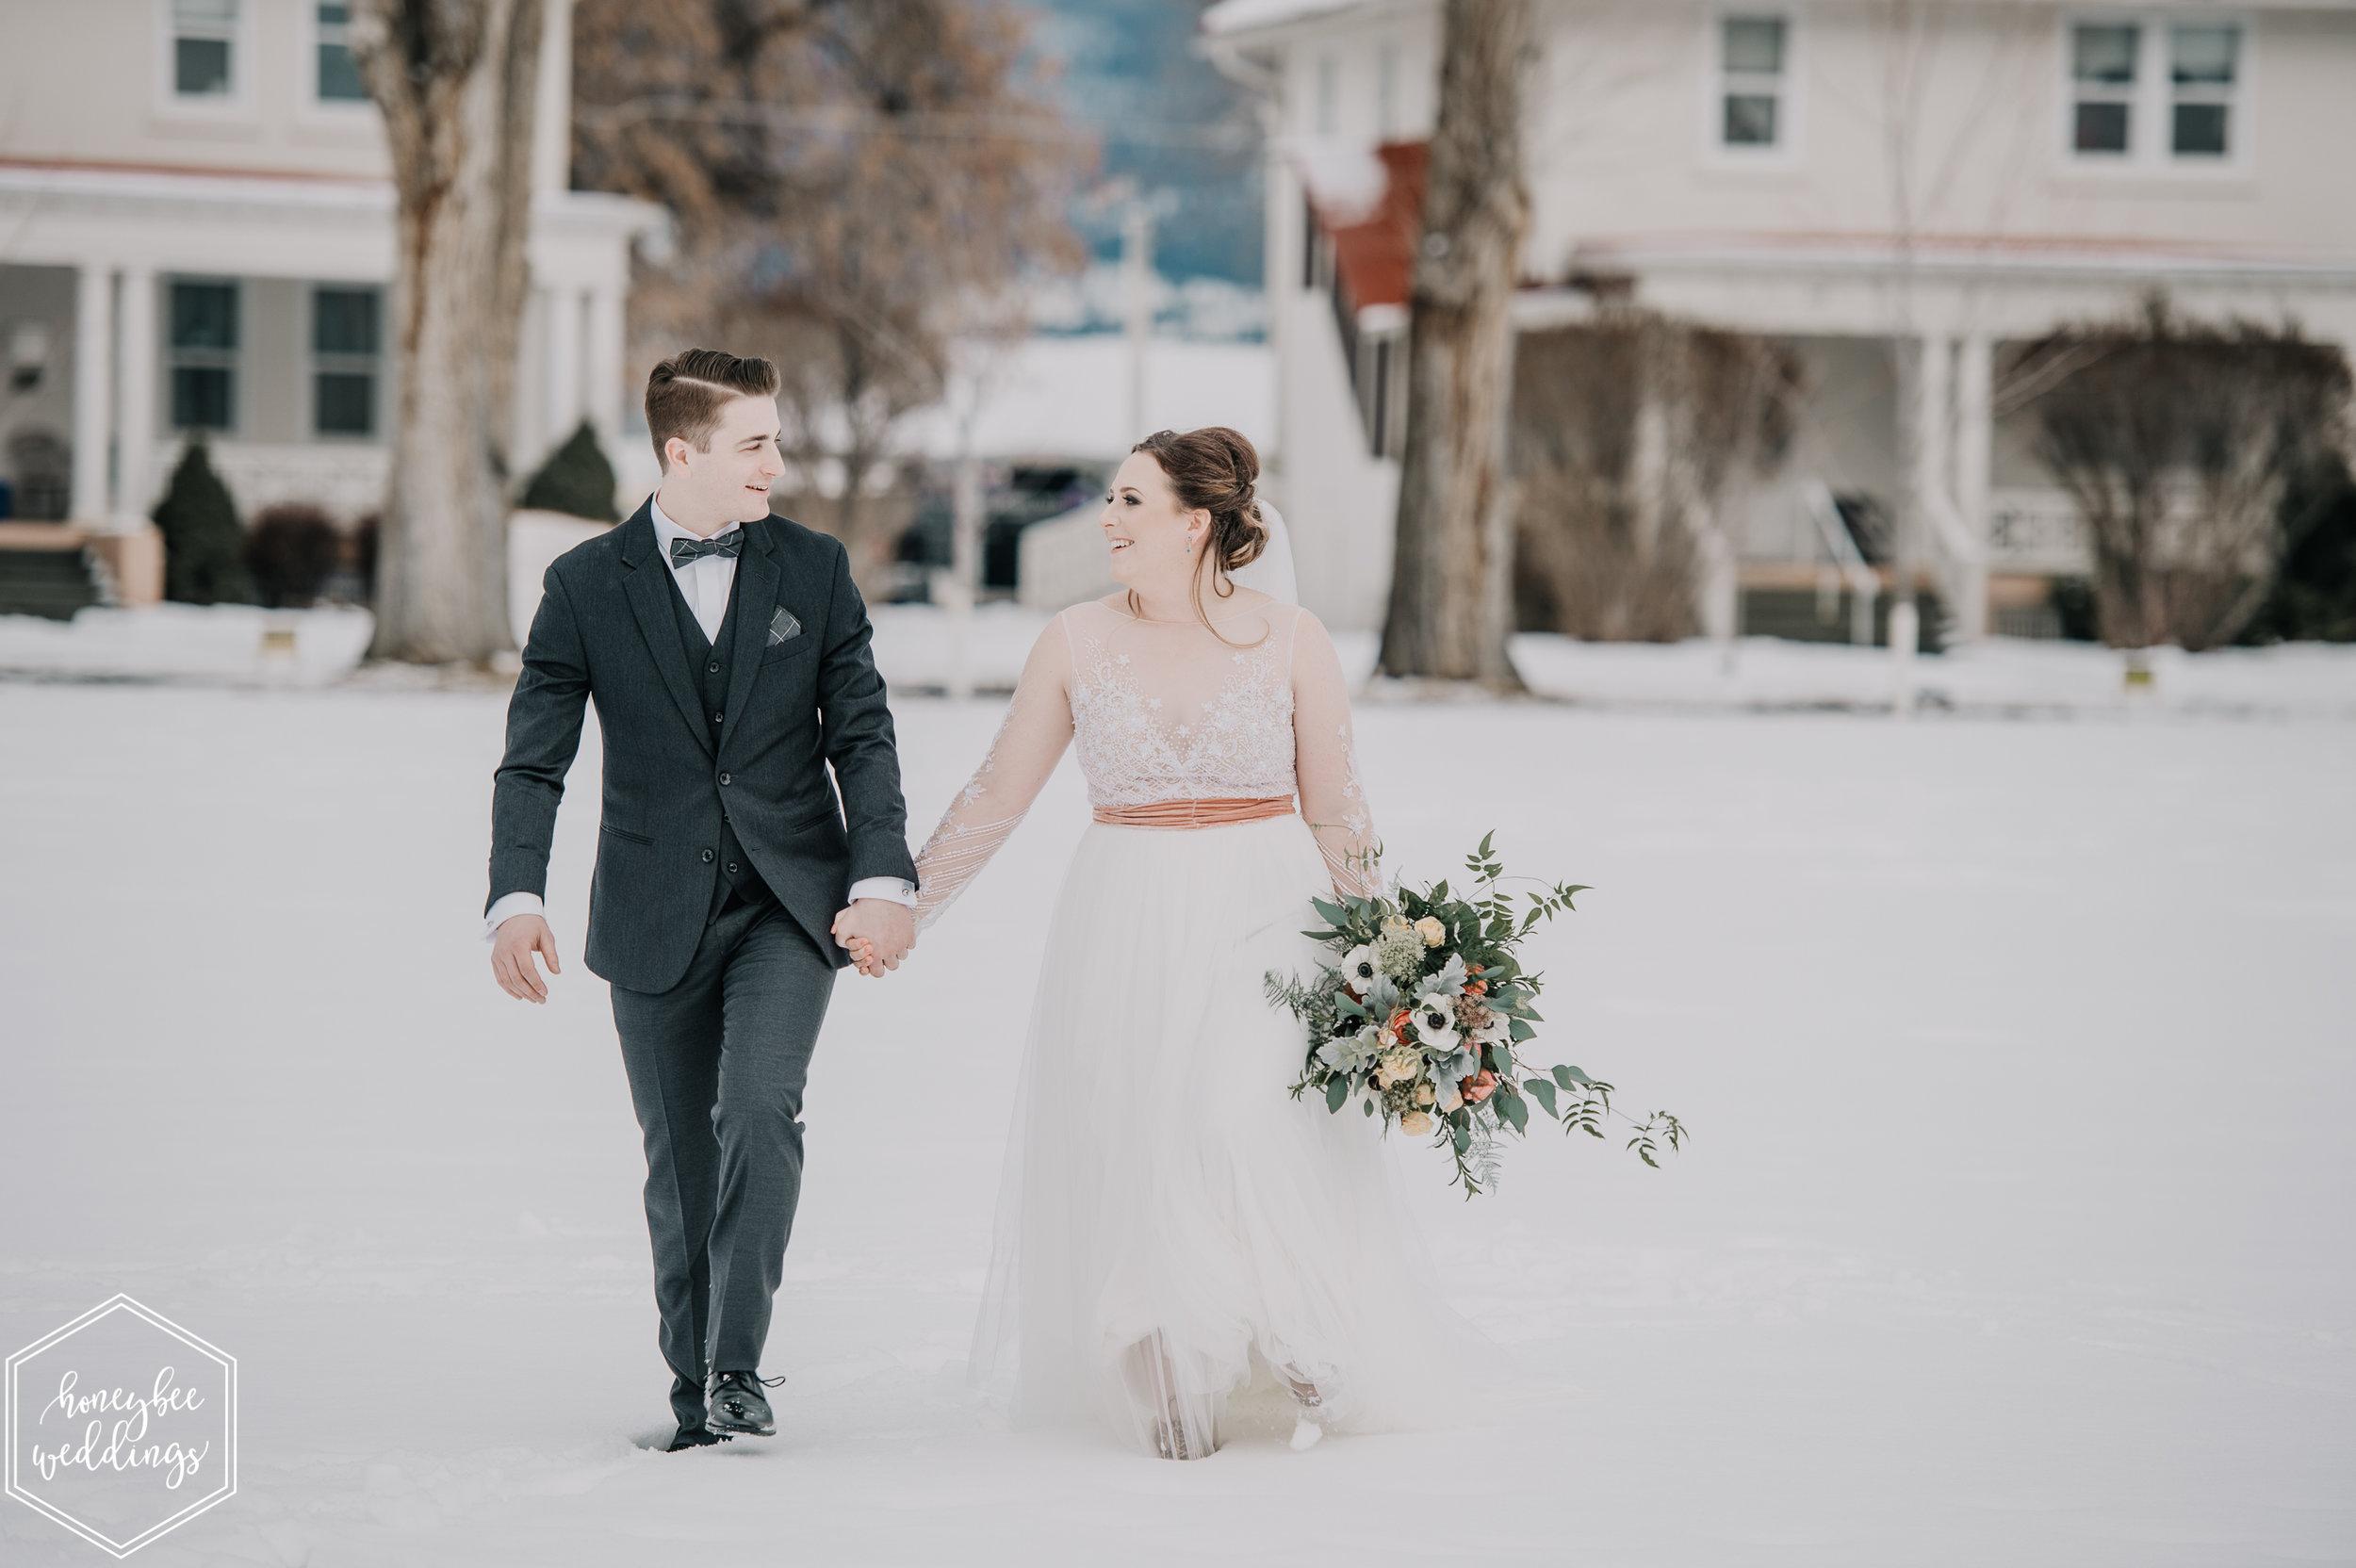 0142Montana Wedding Photographer_Montana winter wedding_Wedding at Fort Missoula_Meri & Carter_January 19, 2019-264.jpg